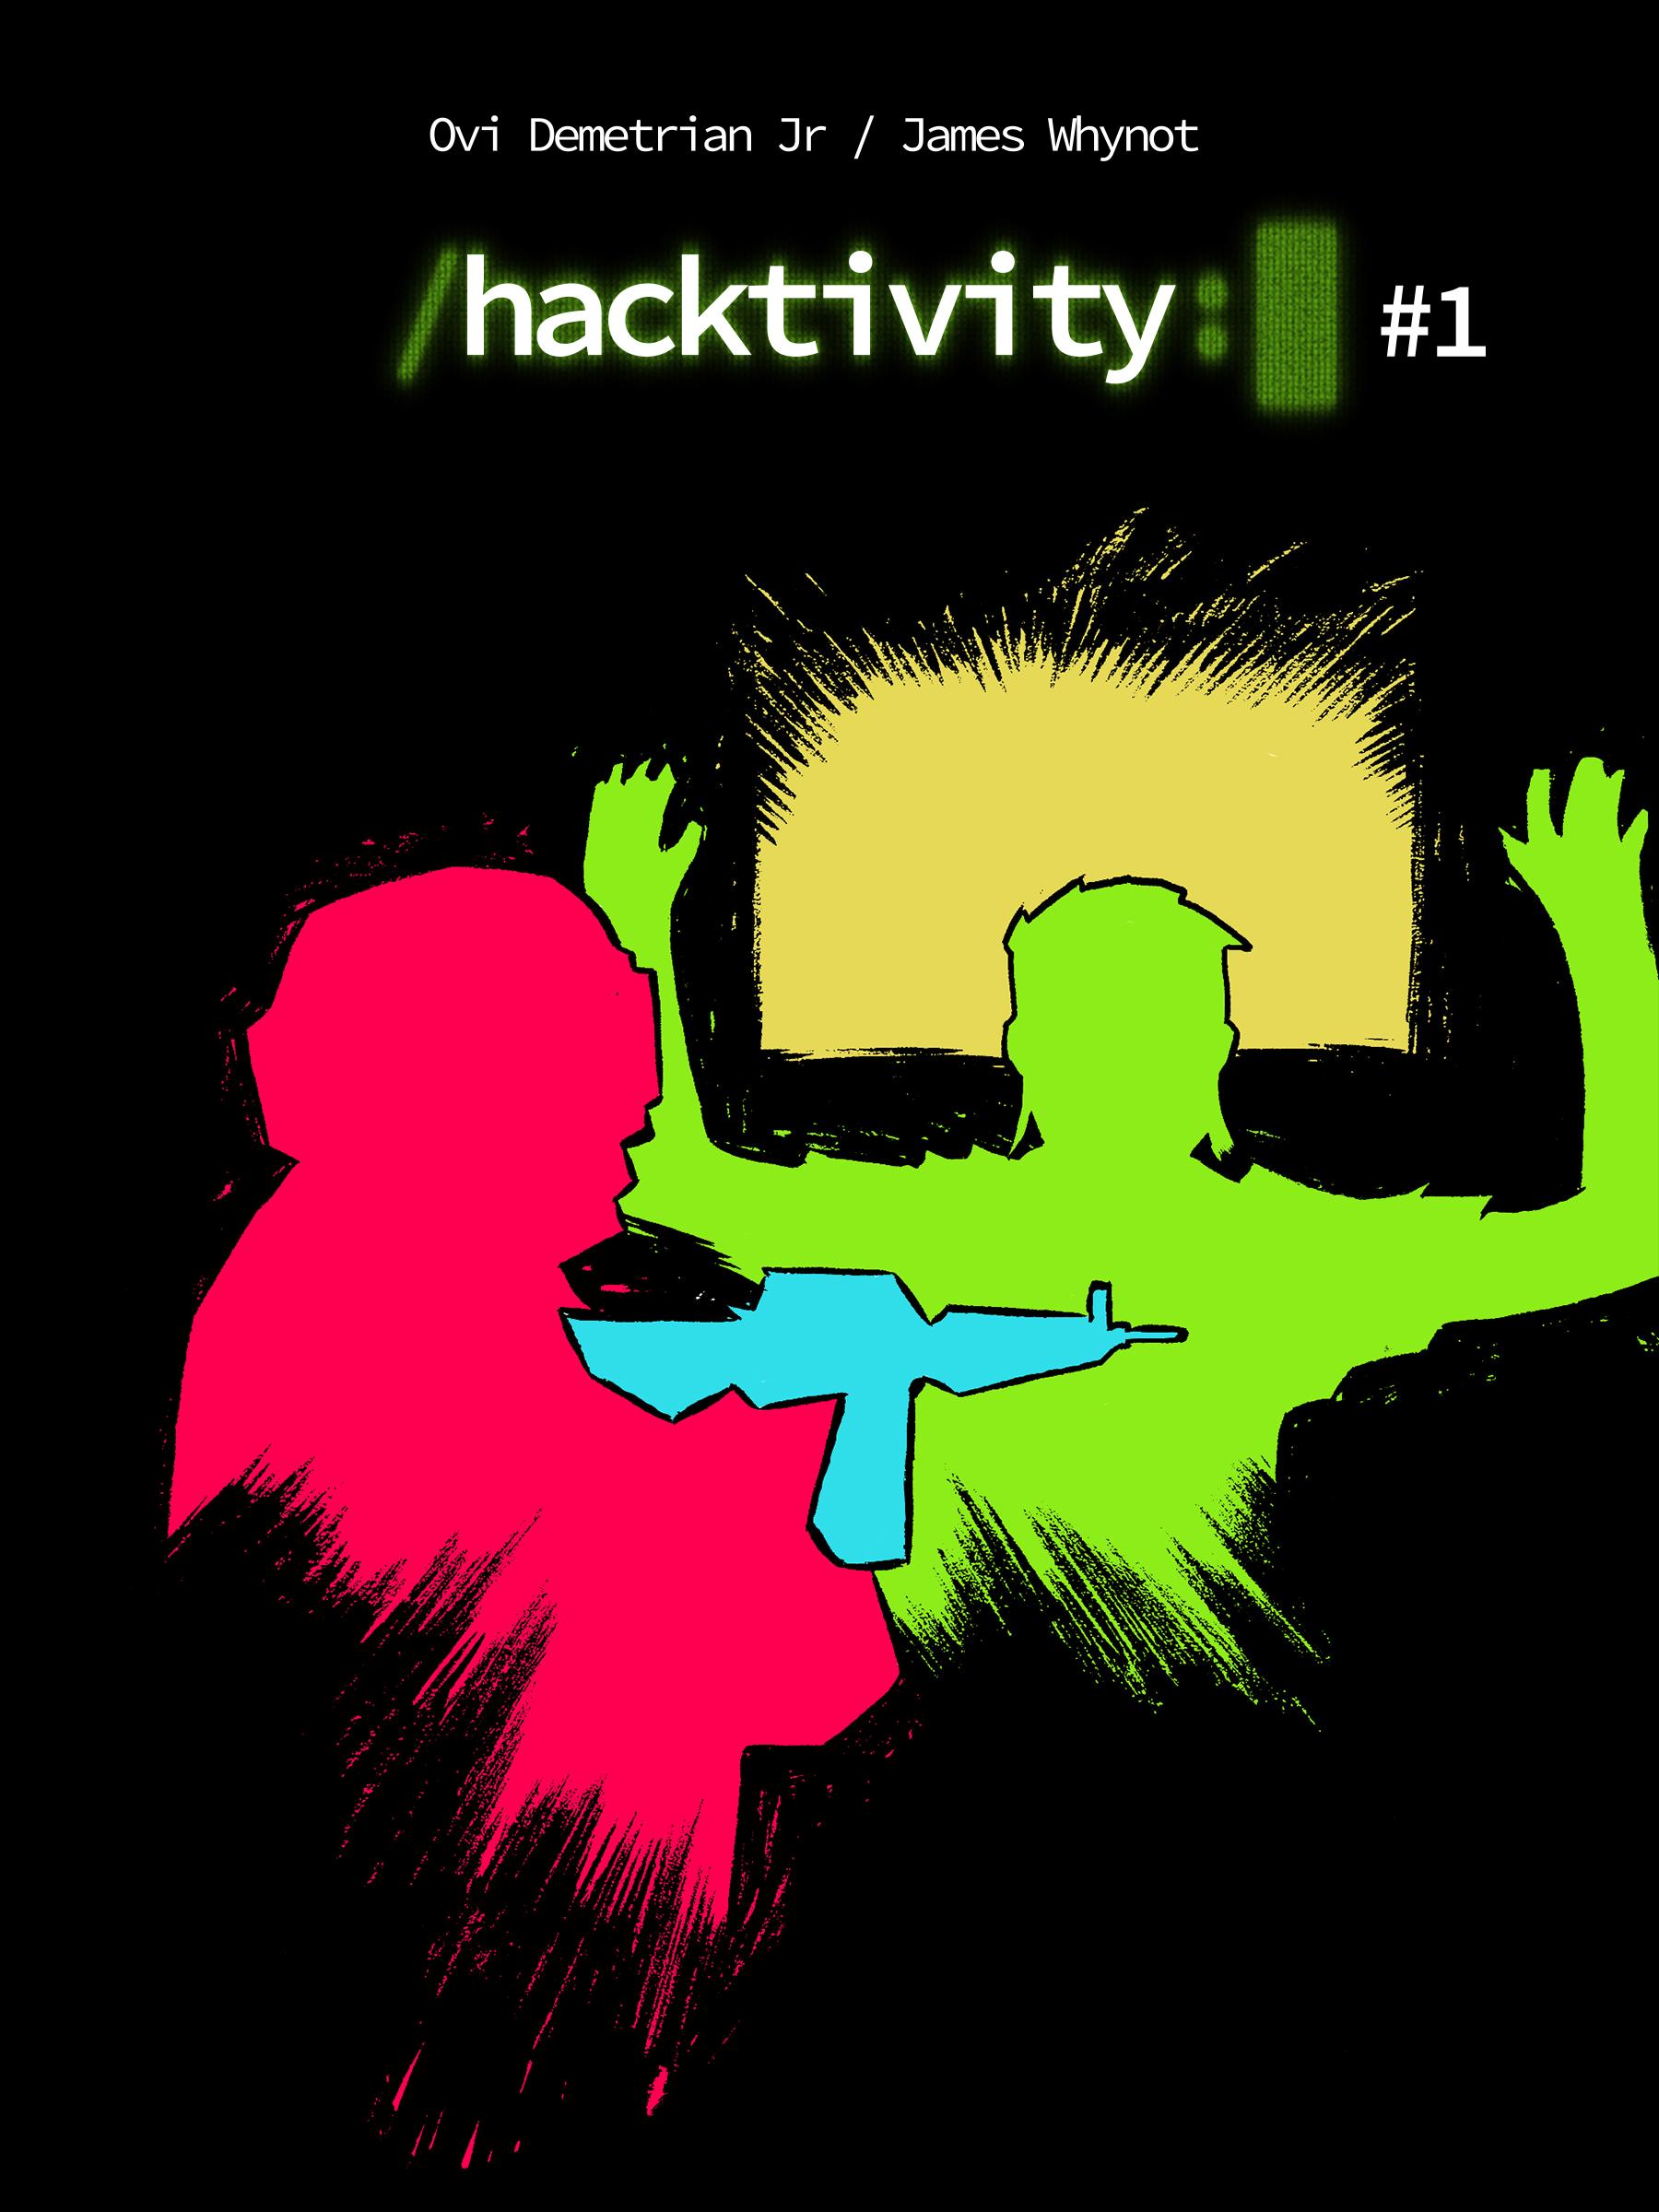 Smashwords – Hacktivity #1 – a book by Ovi Demetrian, Jr